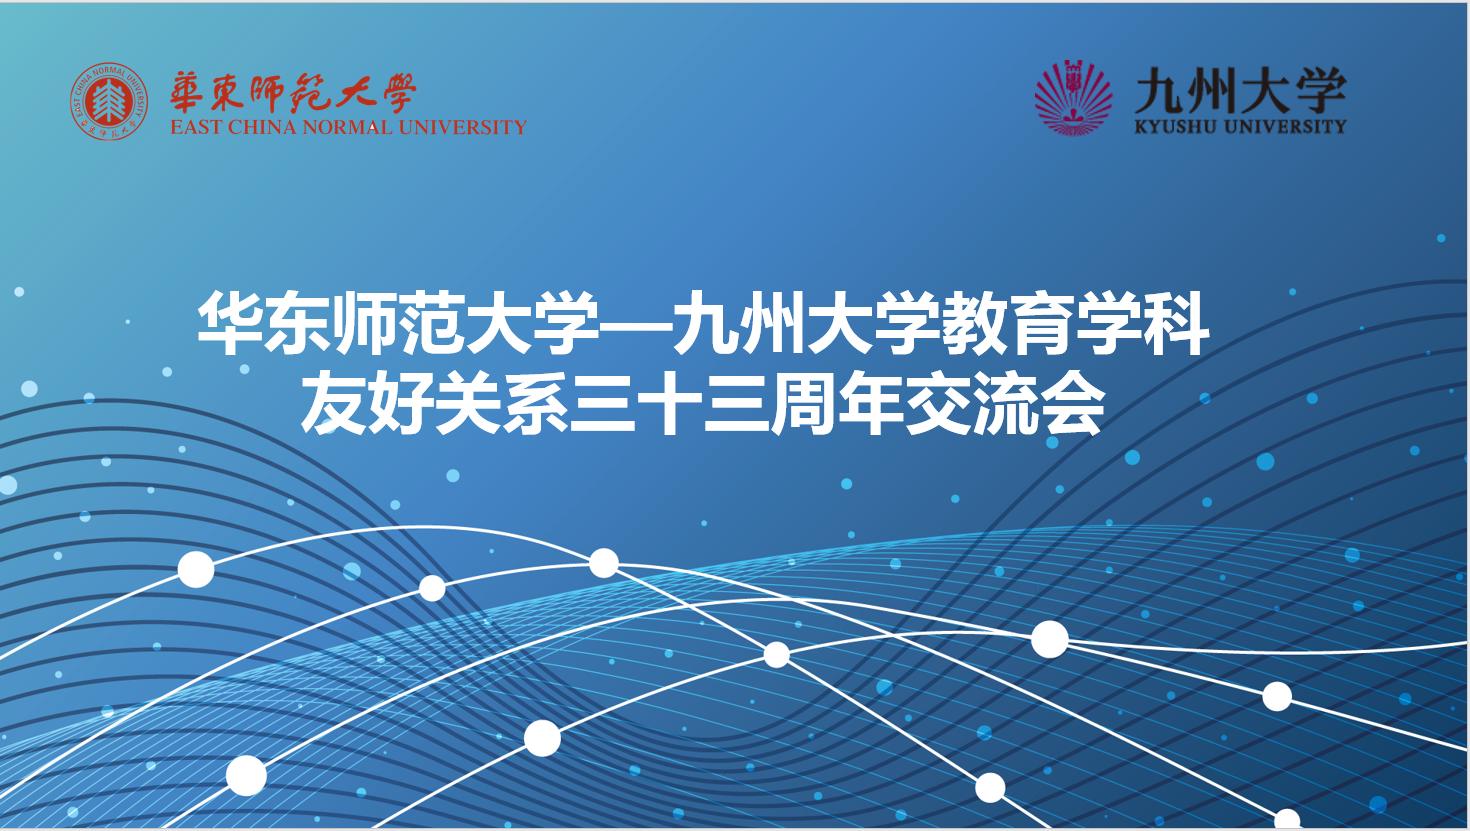 ECNU and Kyushu University Hold Online Symposium on Education Discipline for Thirty-third Anniversary of Partnership